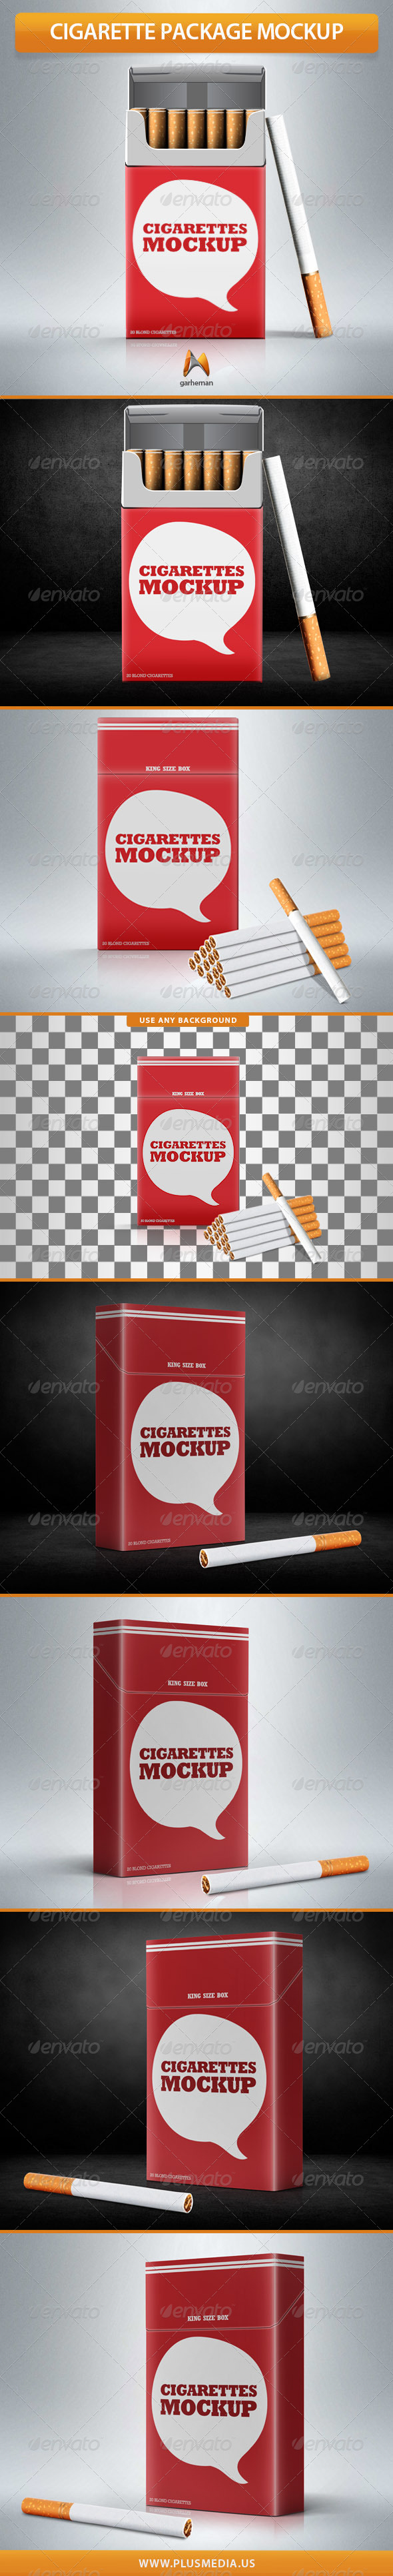 GraphicRiver Cigarette Package Mock-Up 7486243